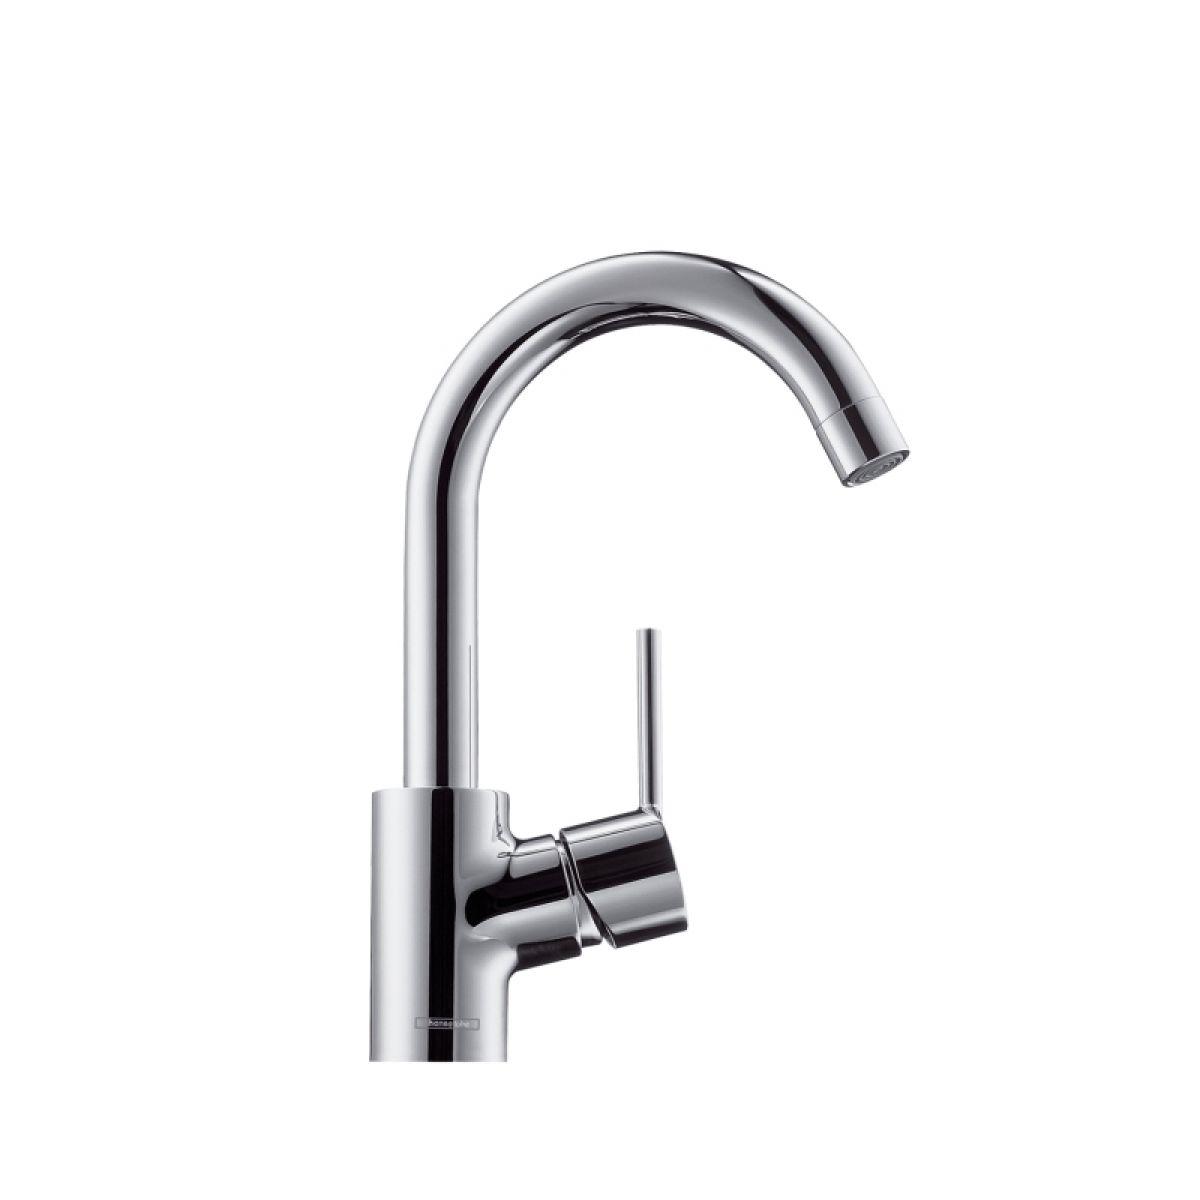 Hansgrohe talis 39 s single lever basin mixer uk bathrooms for Hansgrohe talis